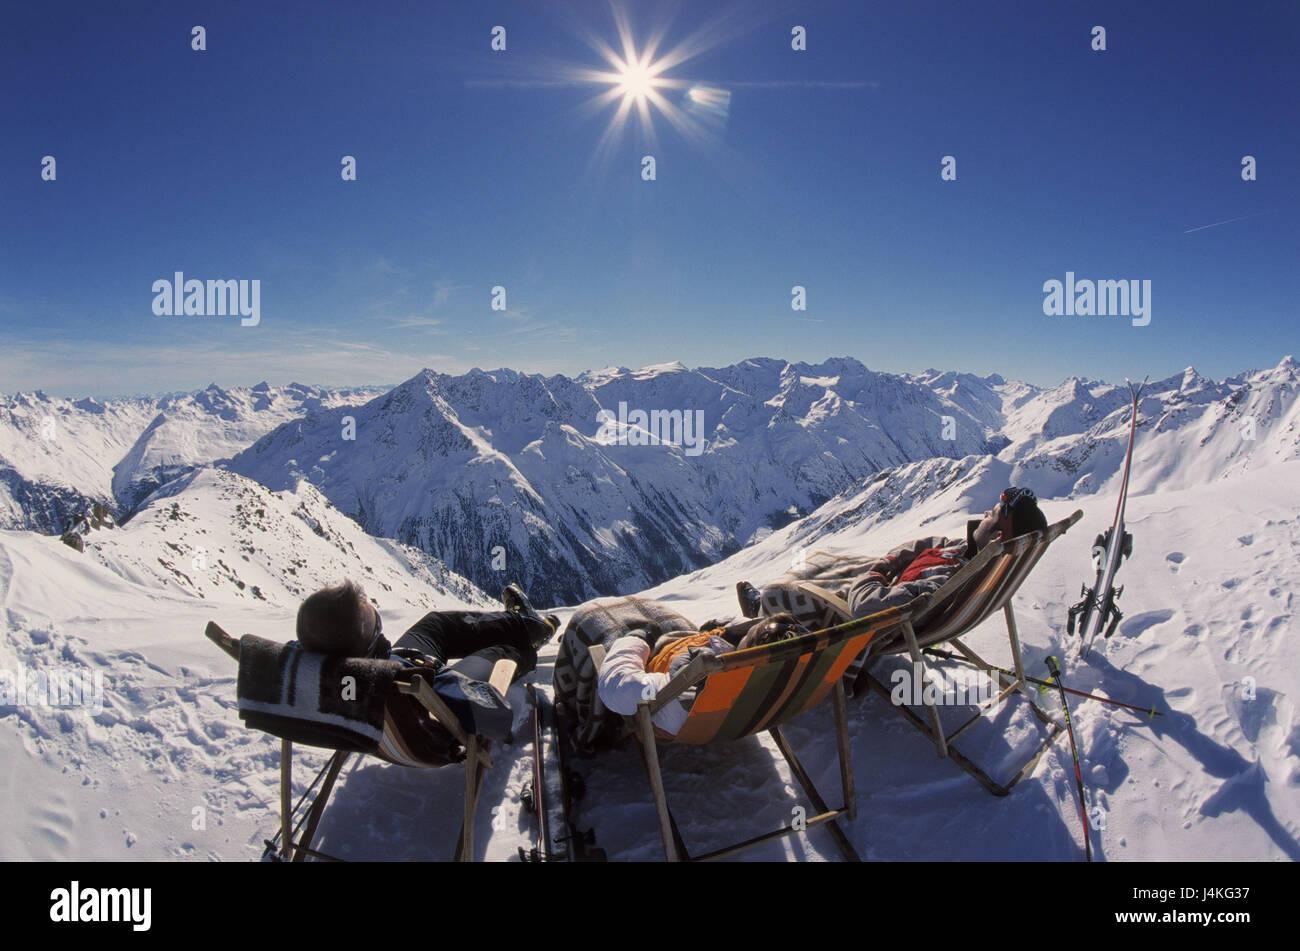 Austria, Tyrol, Ötztaler Alps, Gaislachkogel, Skiers, Deck Chairs, Take It  Easy Europe, Central Alps, Alps, Mountain Landscape, Mountains, Skiing  Area, ...